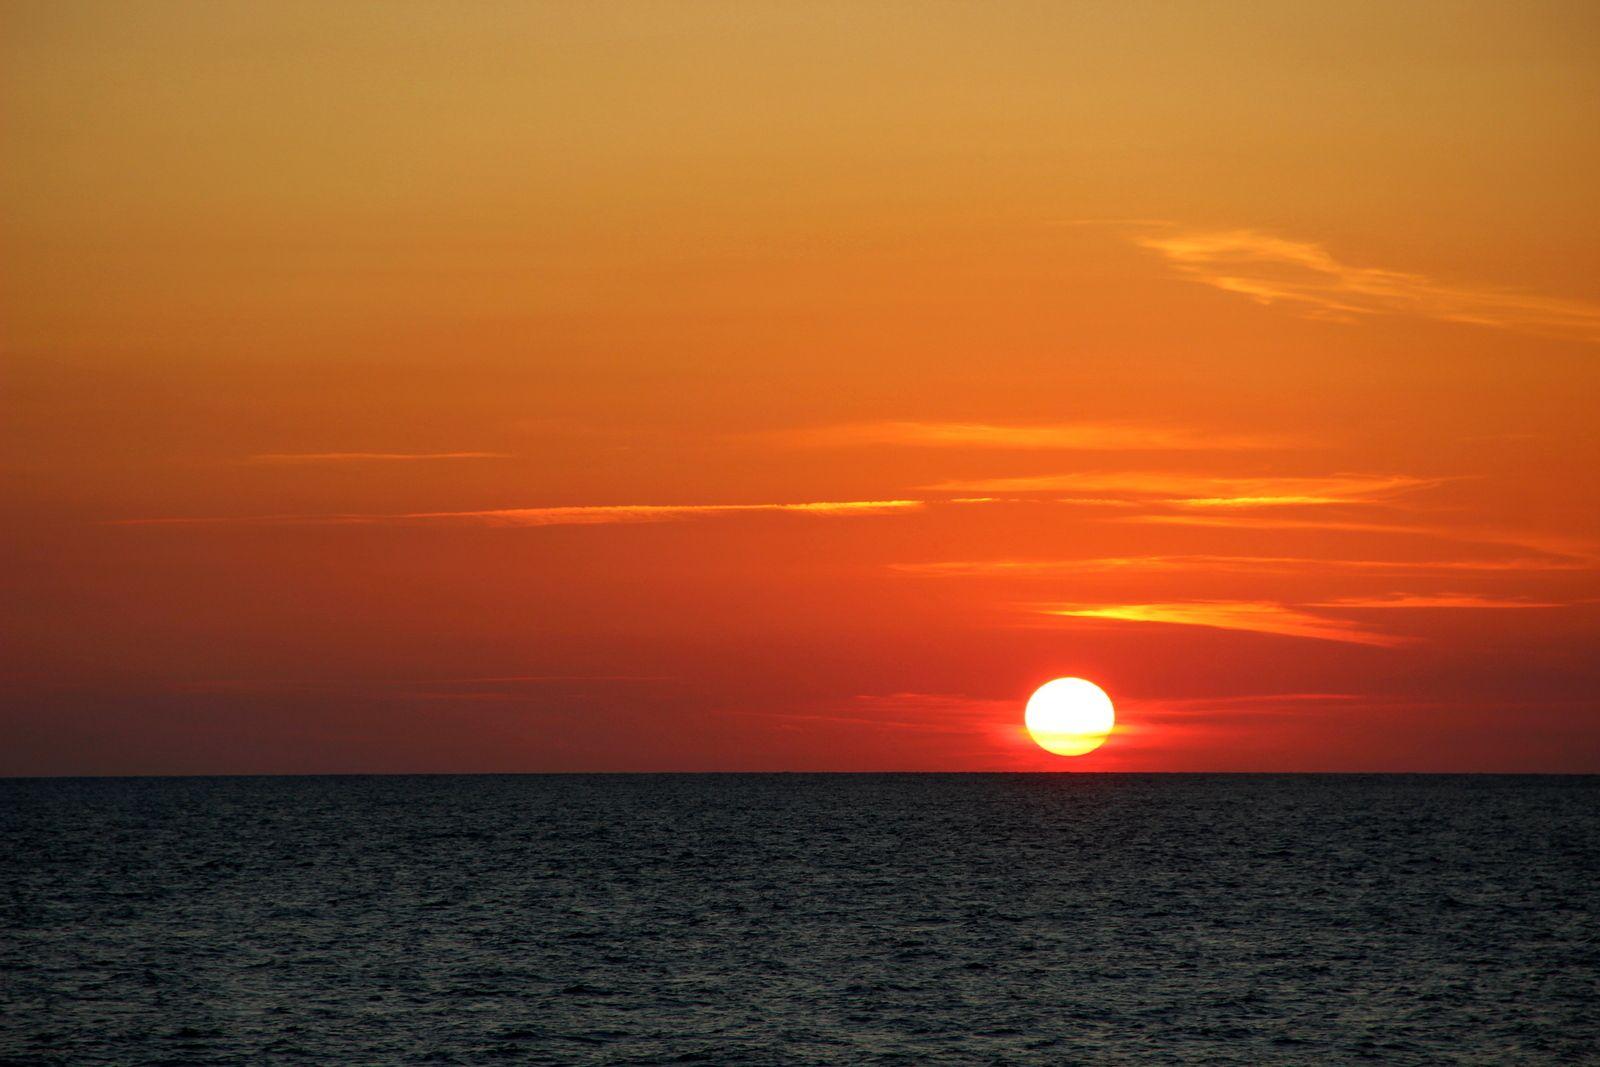 Закат на мысе Херсонес море мыс Херсонес Севастополь